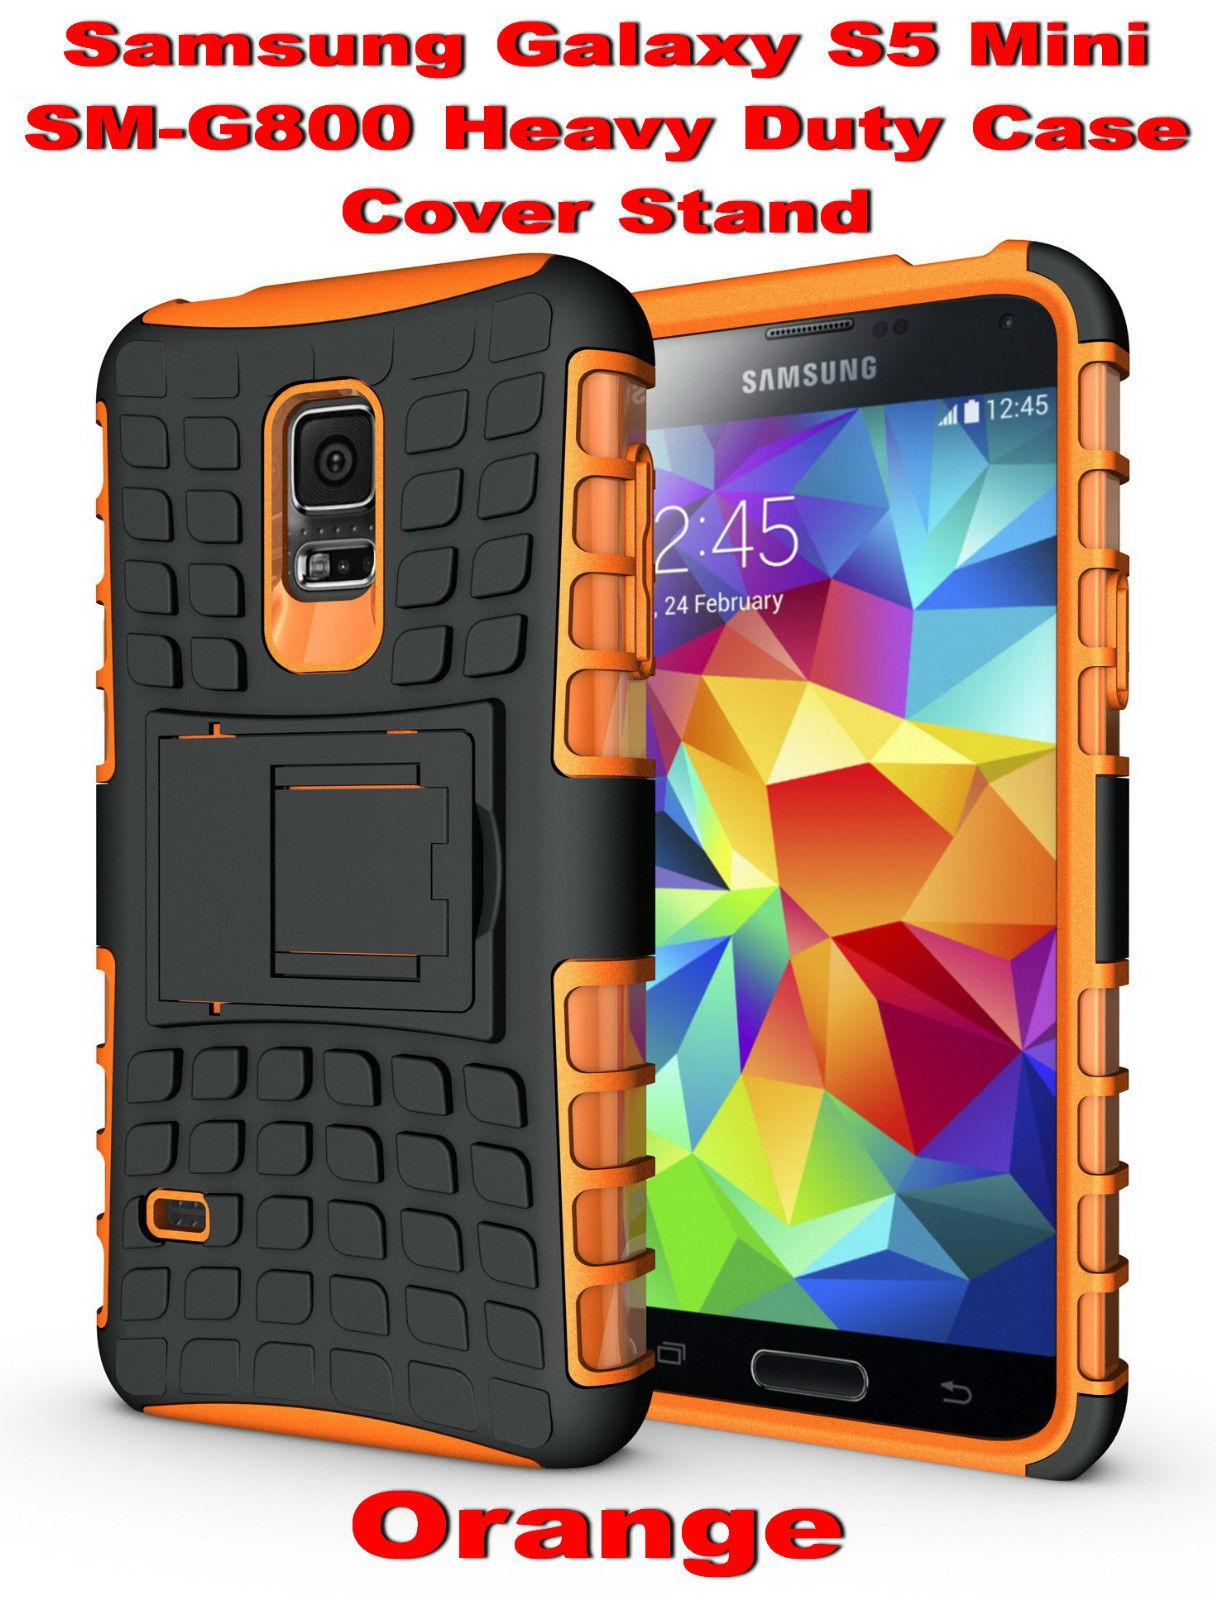 new product 8ffc8 999ed $12.9 AUD - Orange Samsung Galaxy S5 Mini G800 Strong Heavy Duty ...